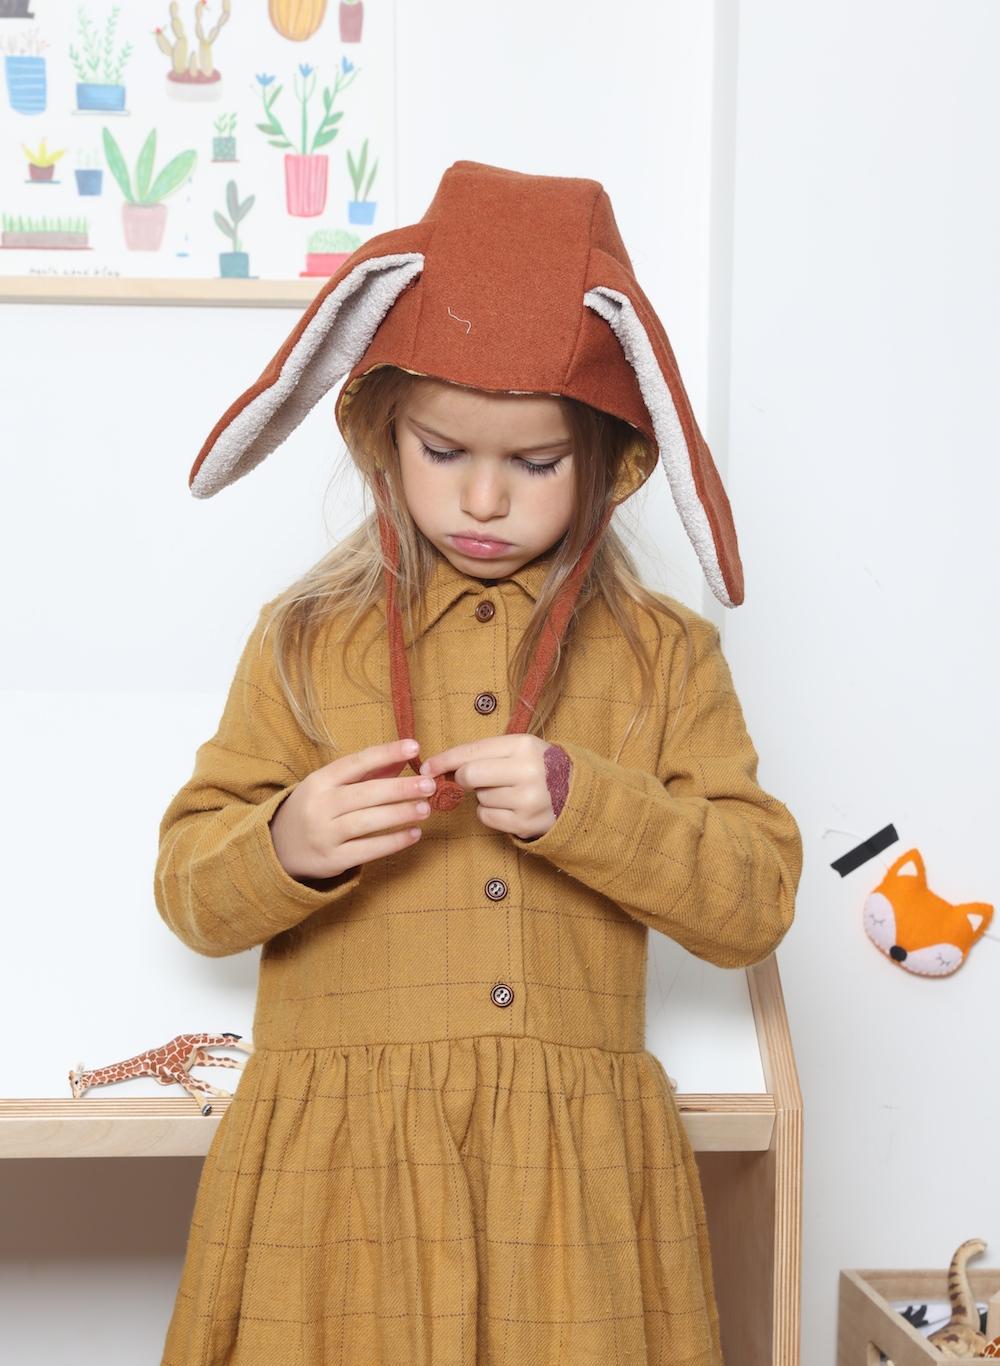 kia_ora_kit_rabbit_bunny_ears_hat